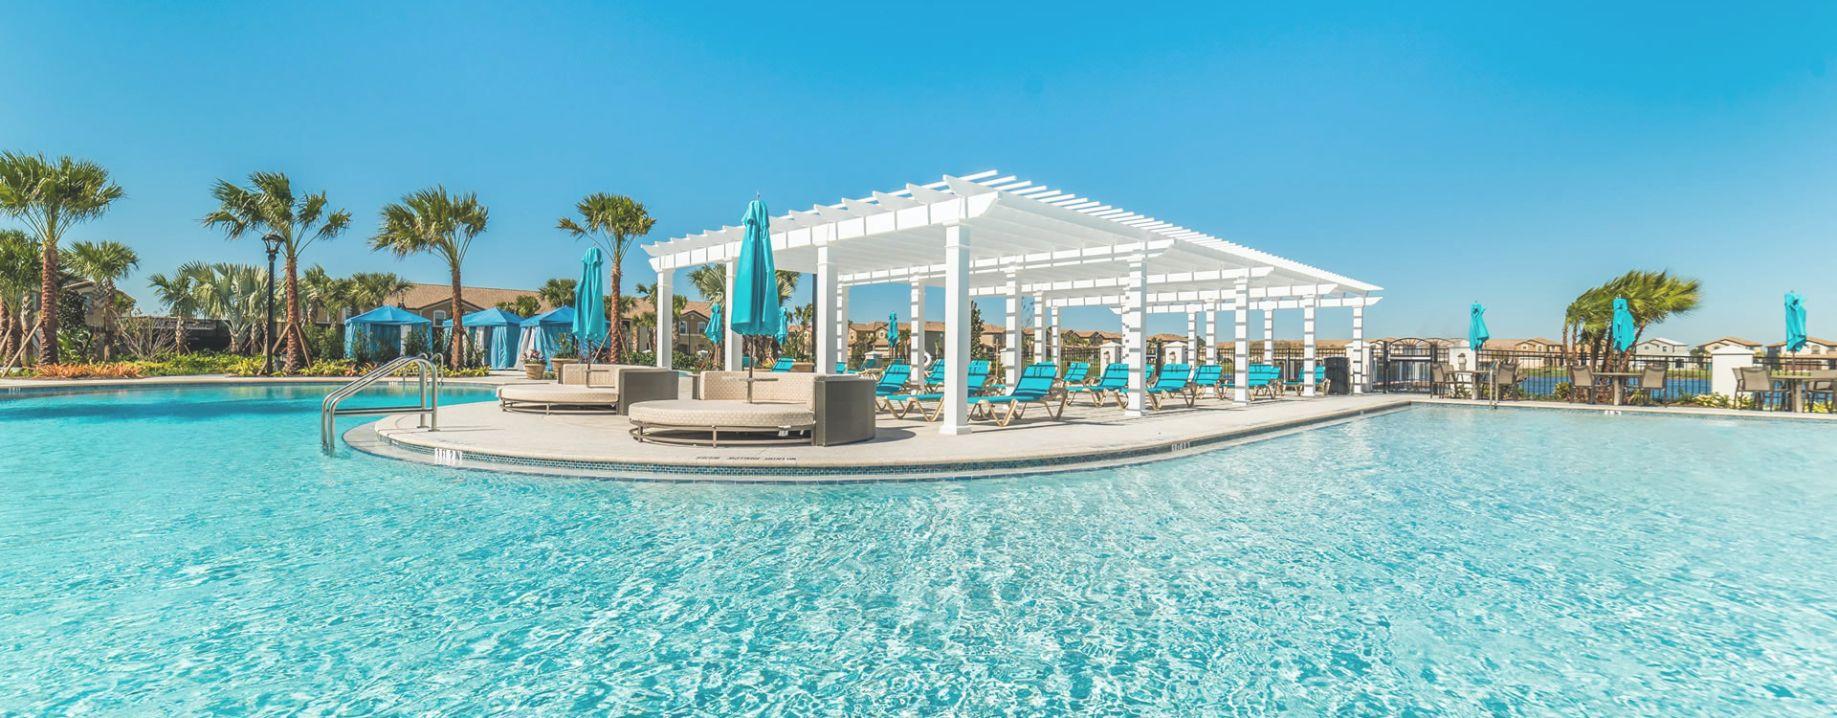 Global Resort Homes' Resort Vacation Homes in Orlando